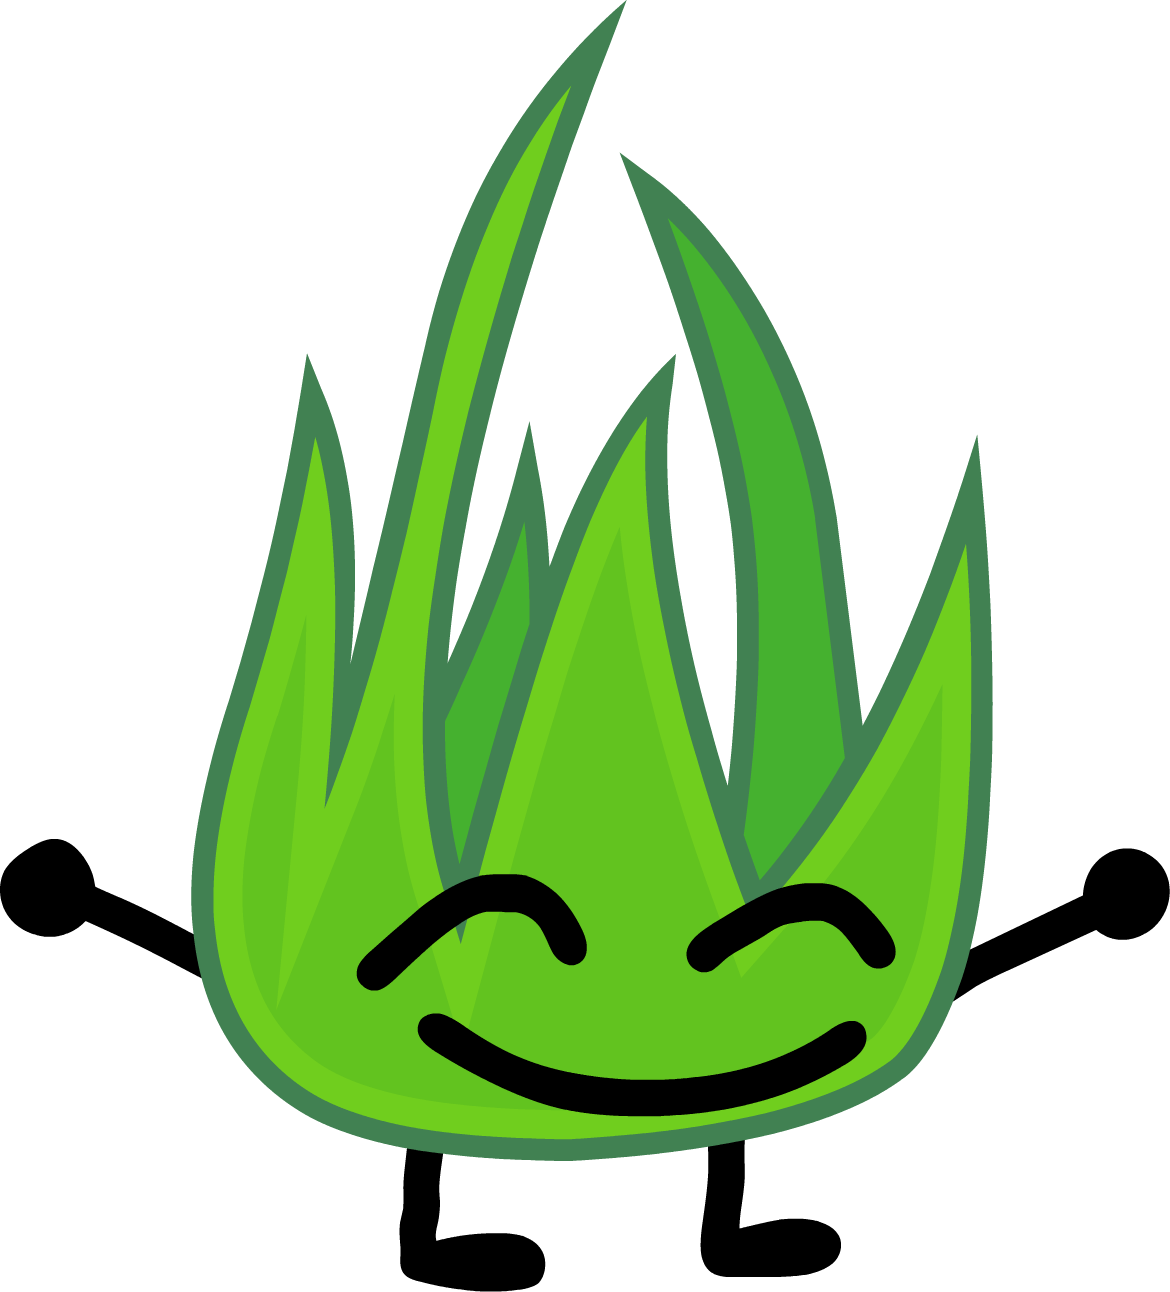 Grassy (BFDI)